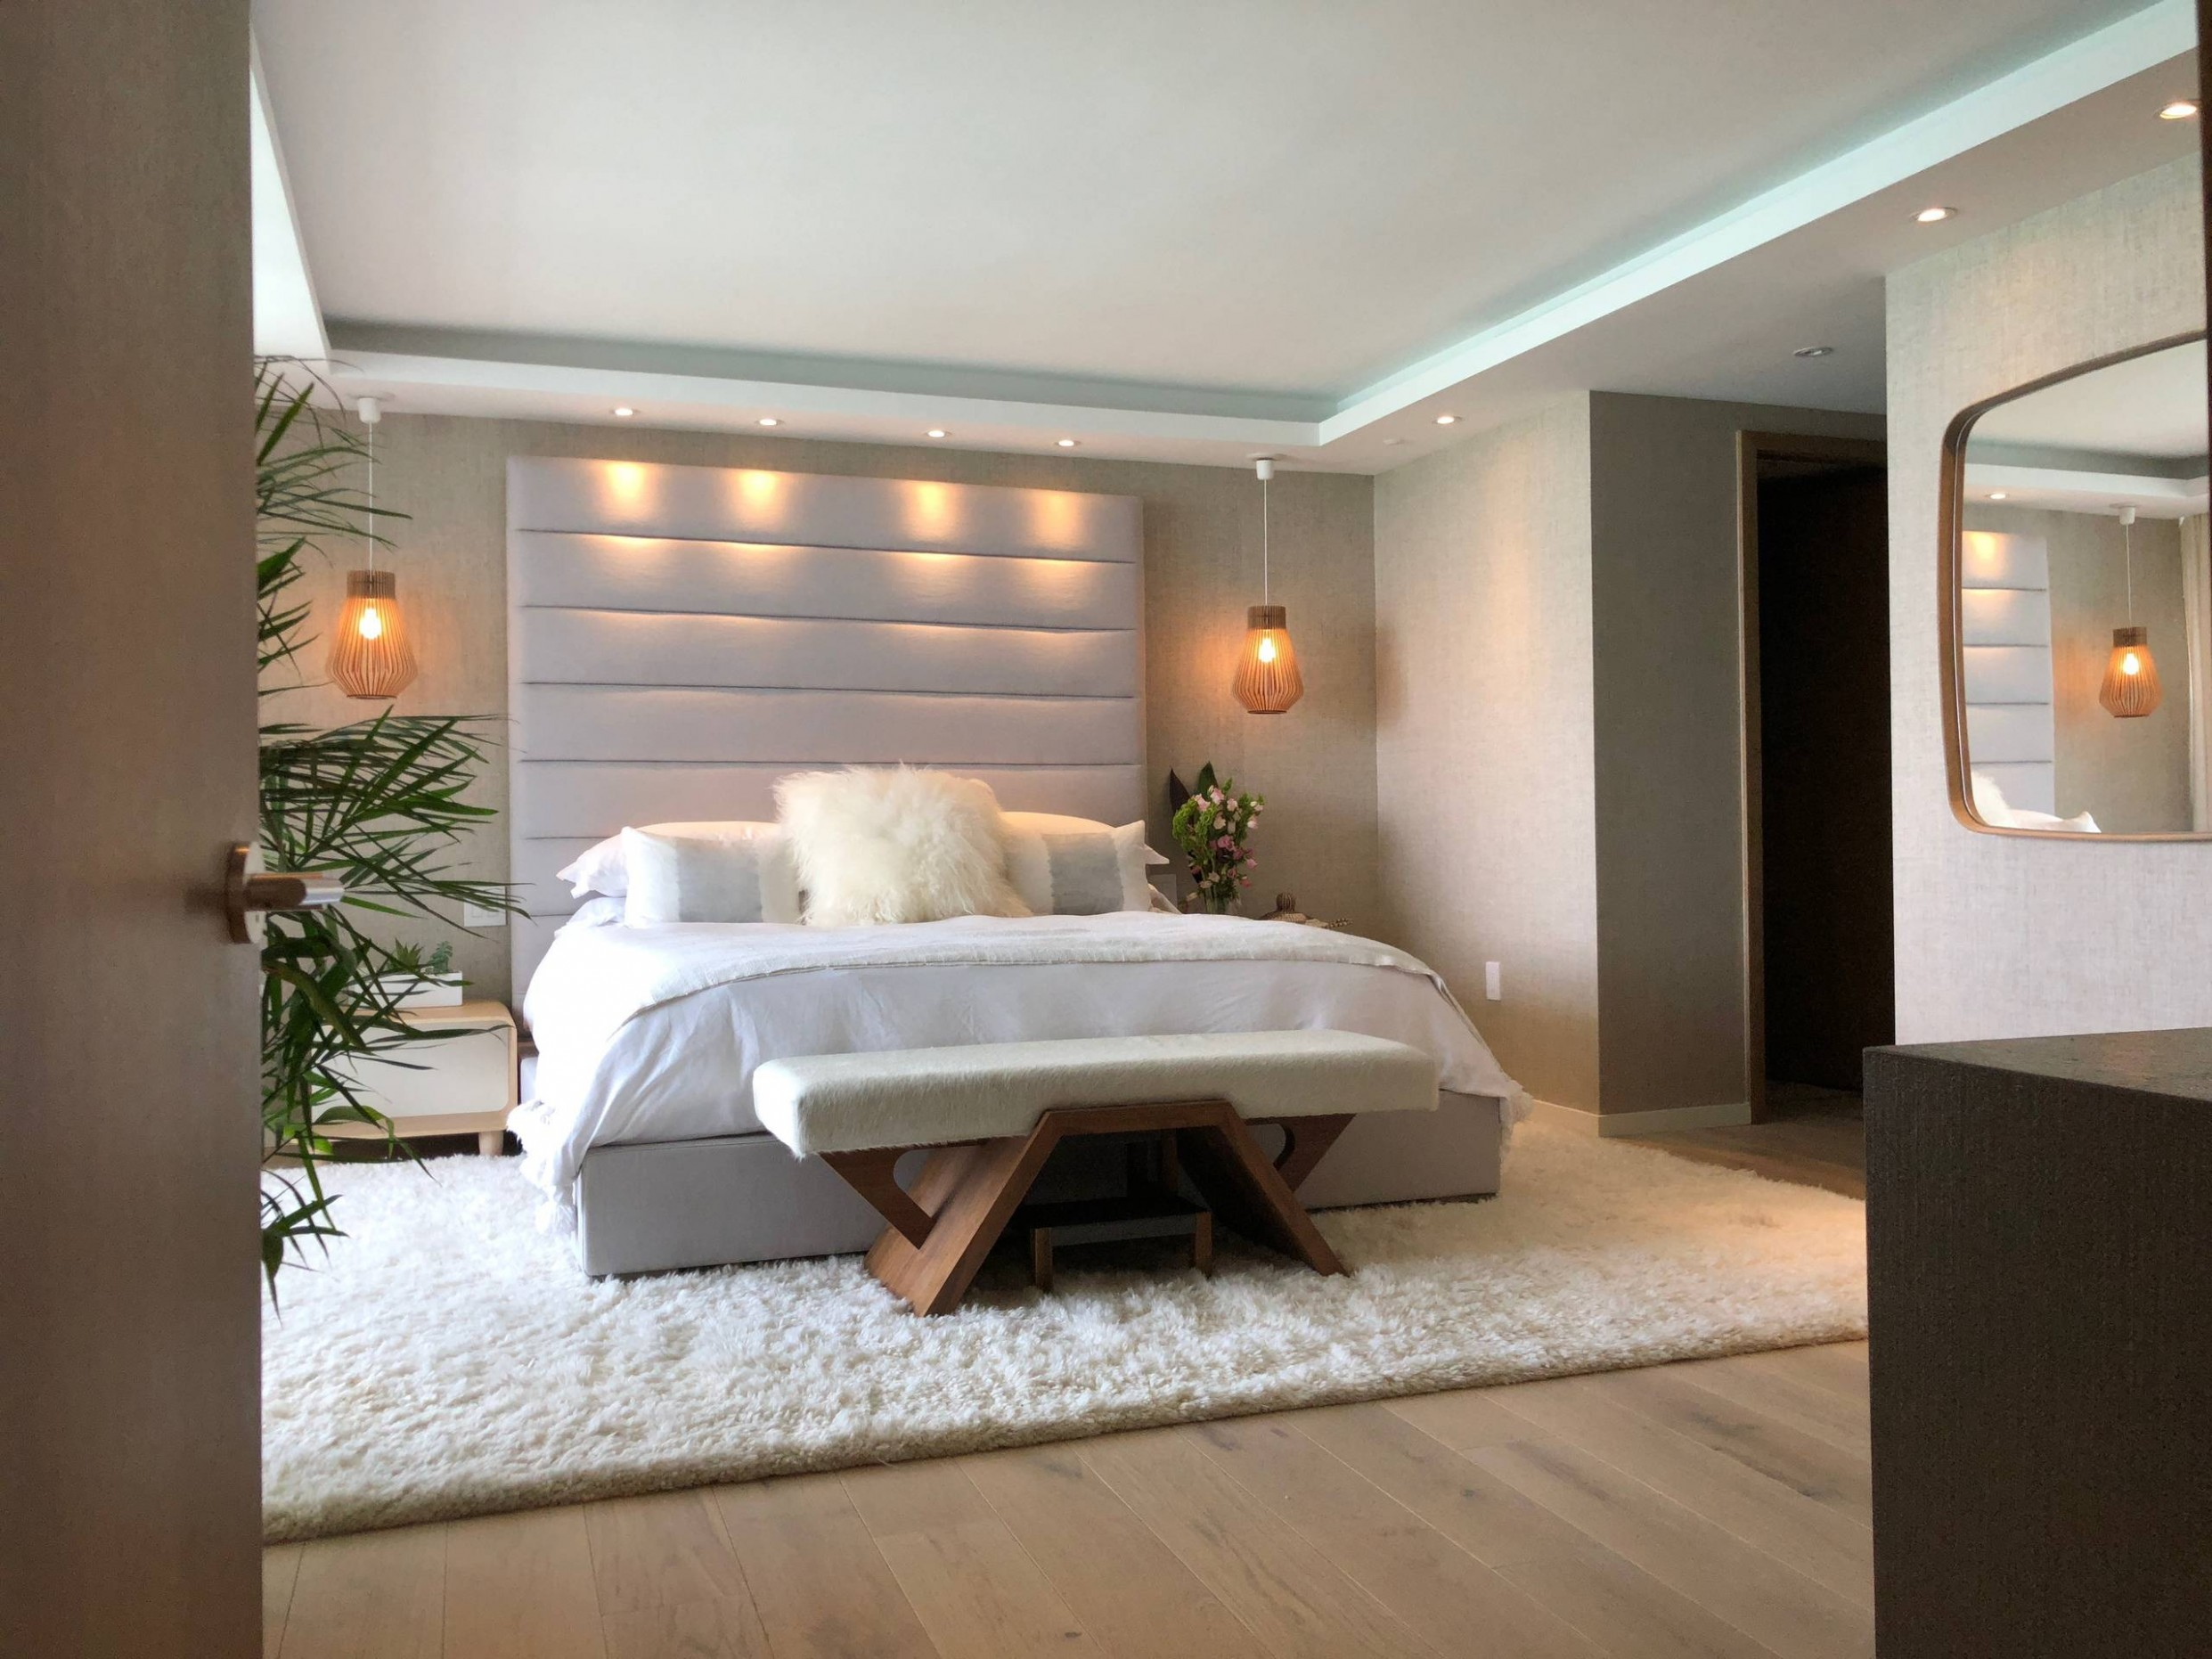 11 Beautiful Modern Bedroom Pictures & Ideas - November, 11  Houzz - Bedroom Ideas Houzz